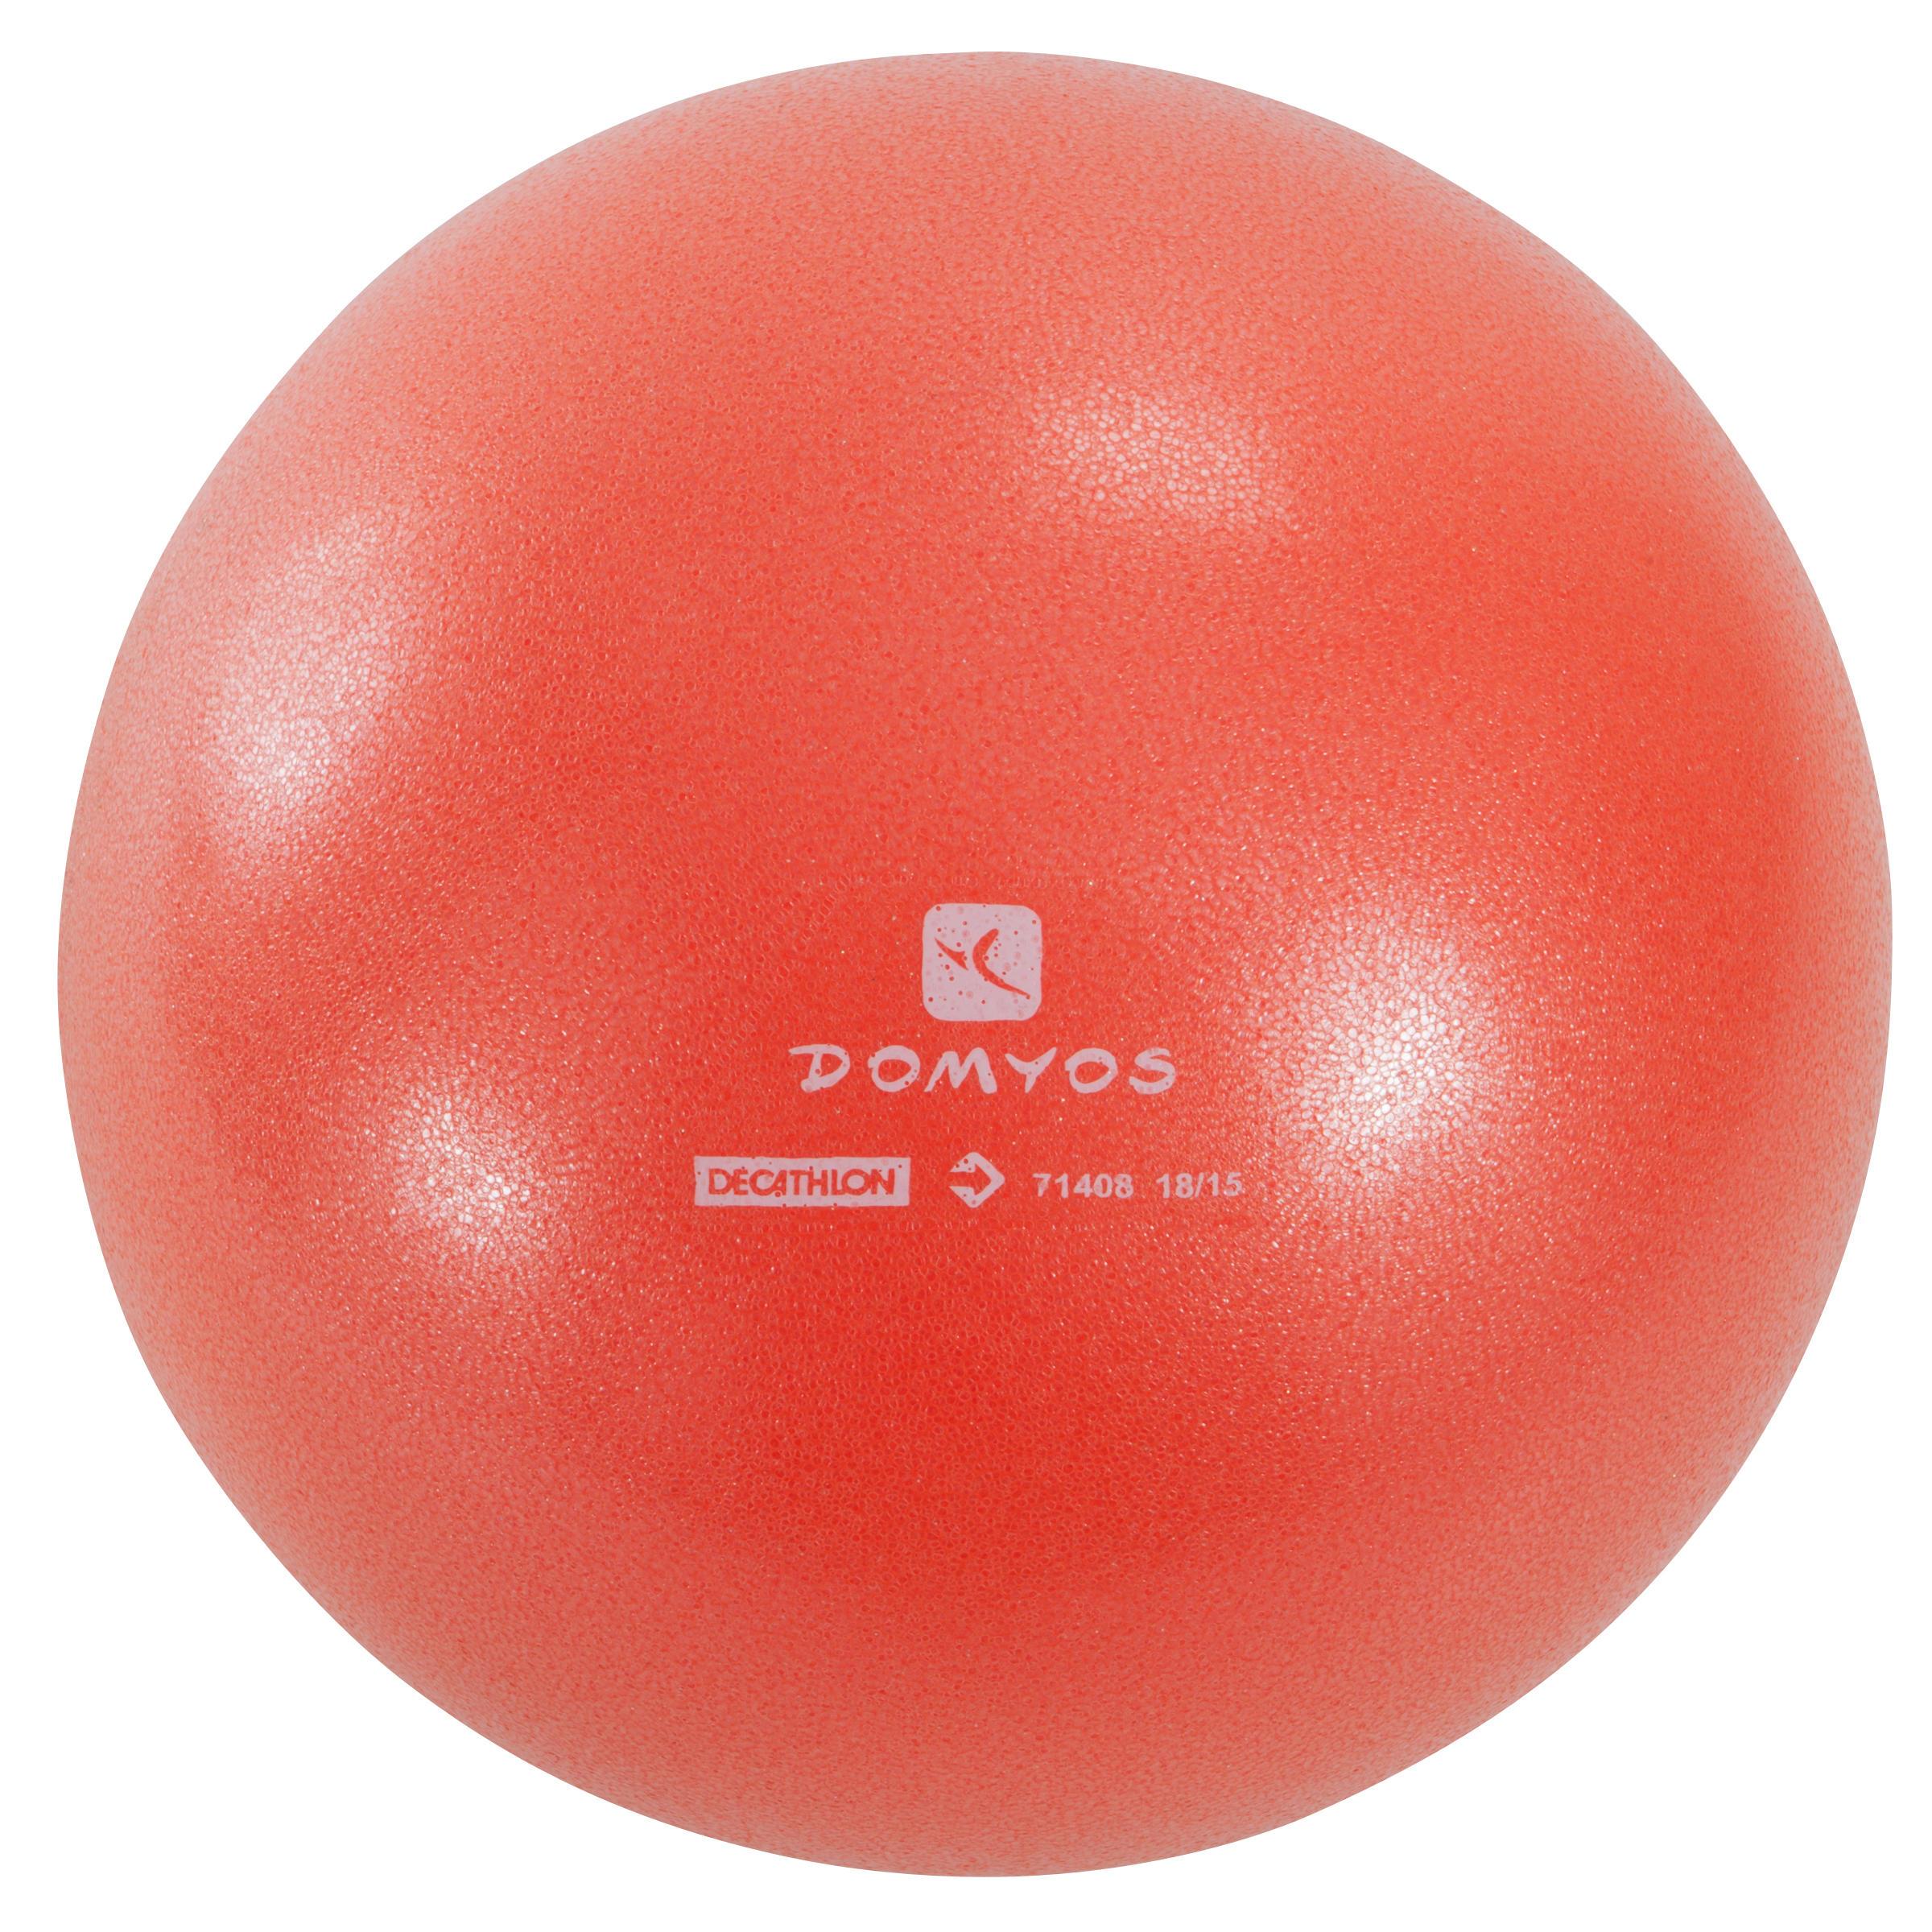 Domyos Pilates Soft Ball large